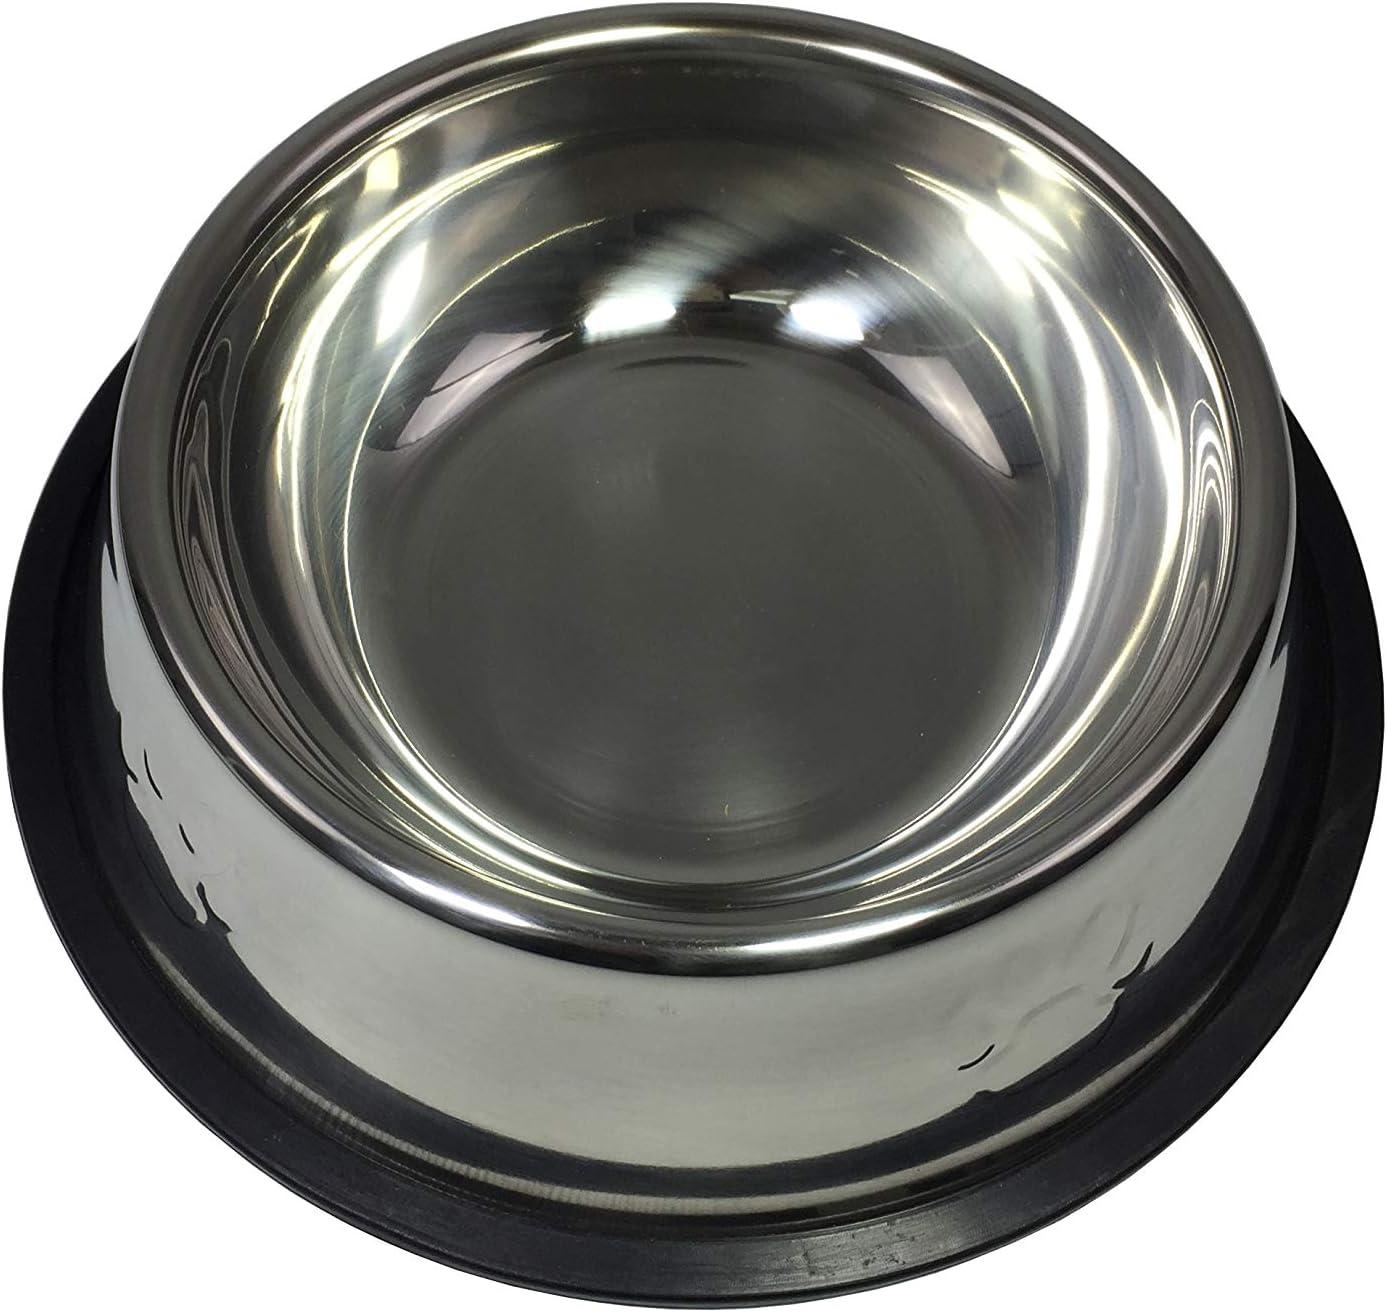 FixtureDisplays 16-oz Dog/Cat Bowl Stainless Steel Dog Pet Food or Water Bowl Dish 12195 12195